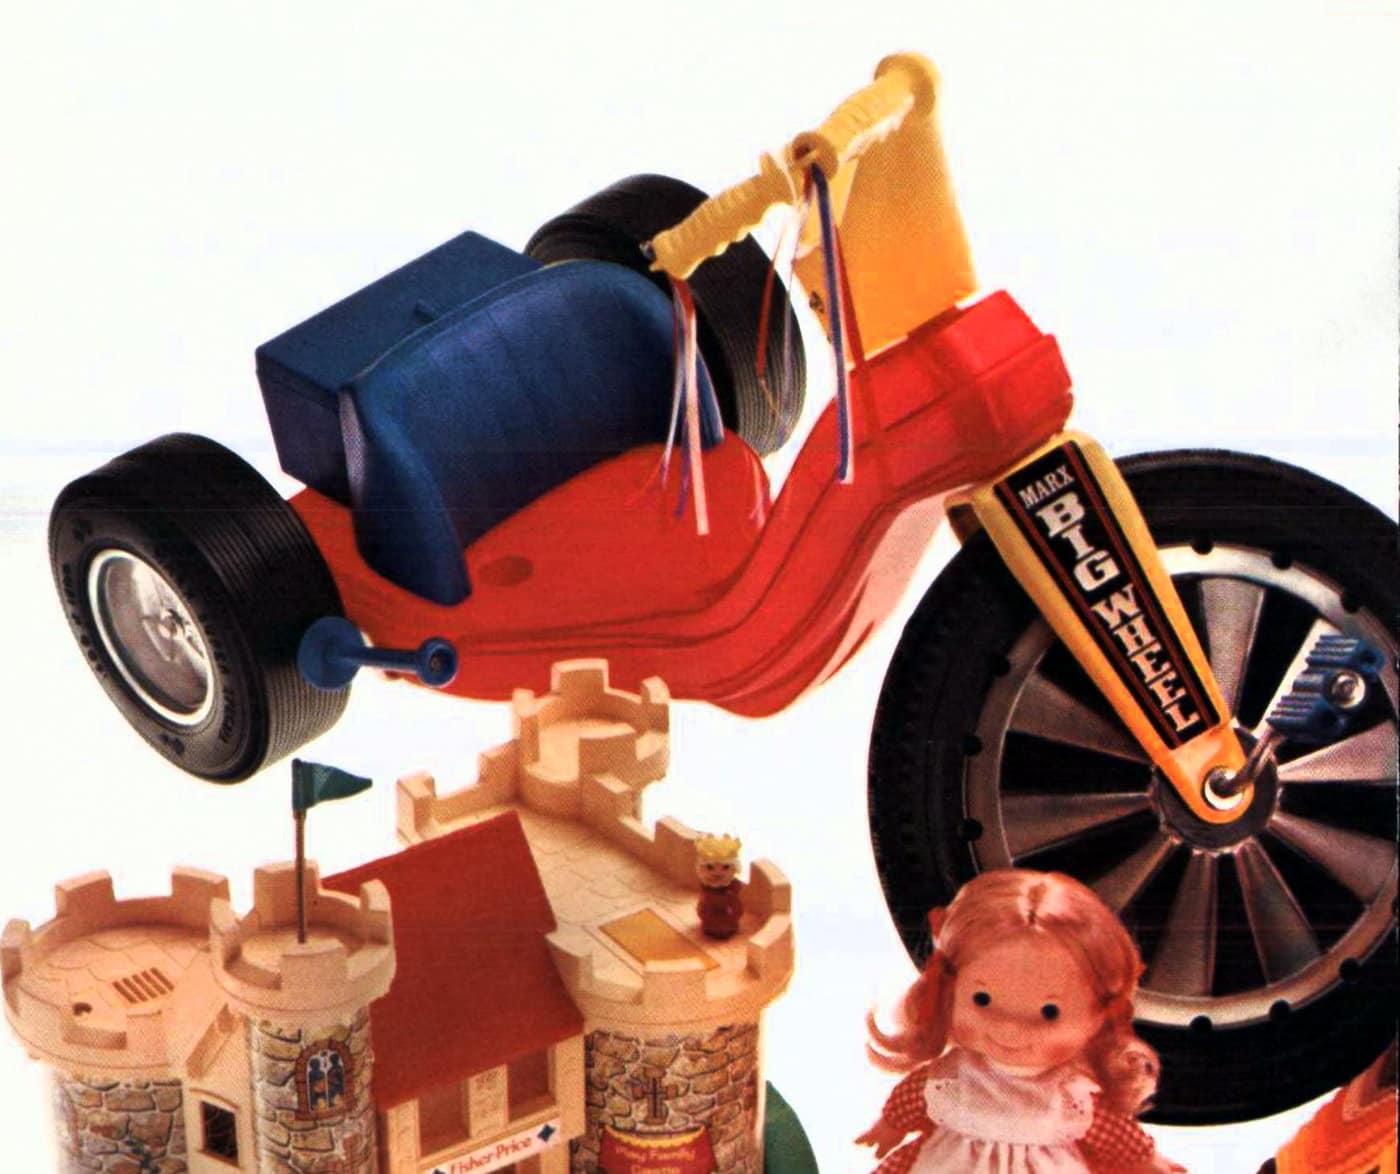 Vintage Big Wheel toys